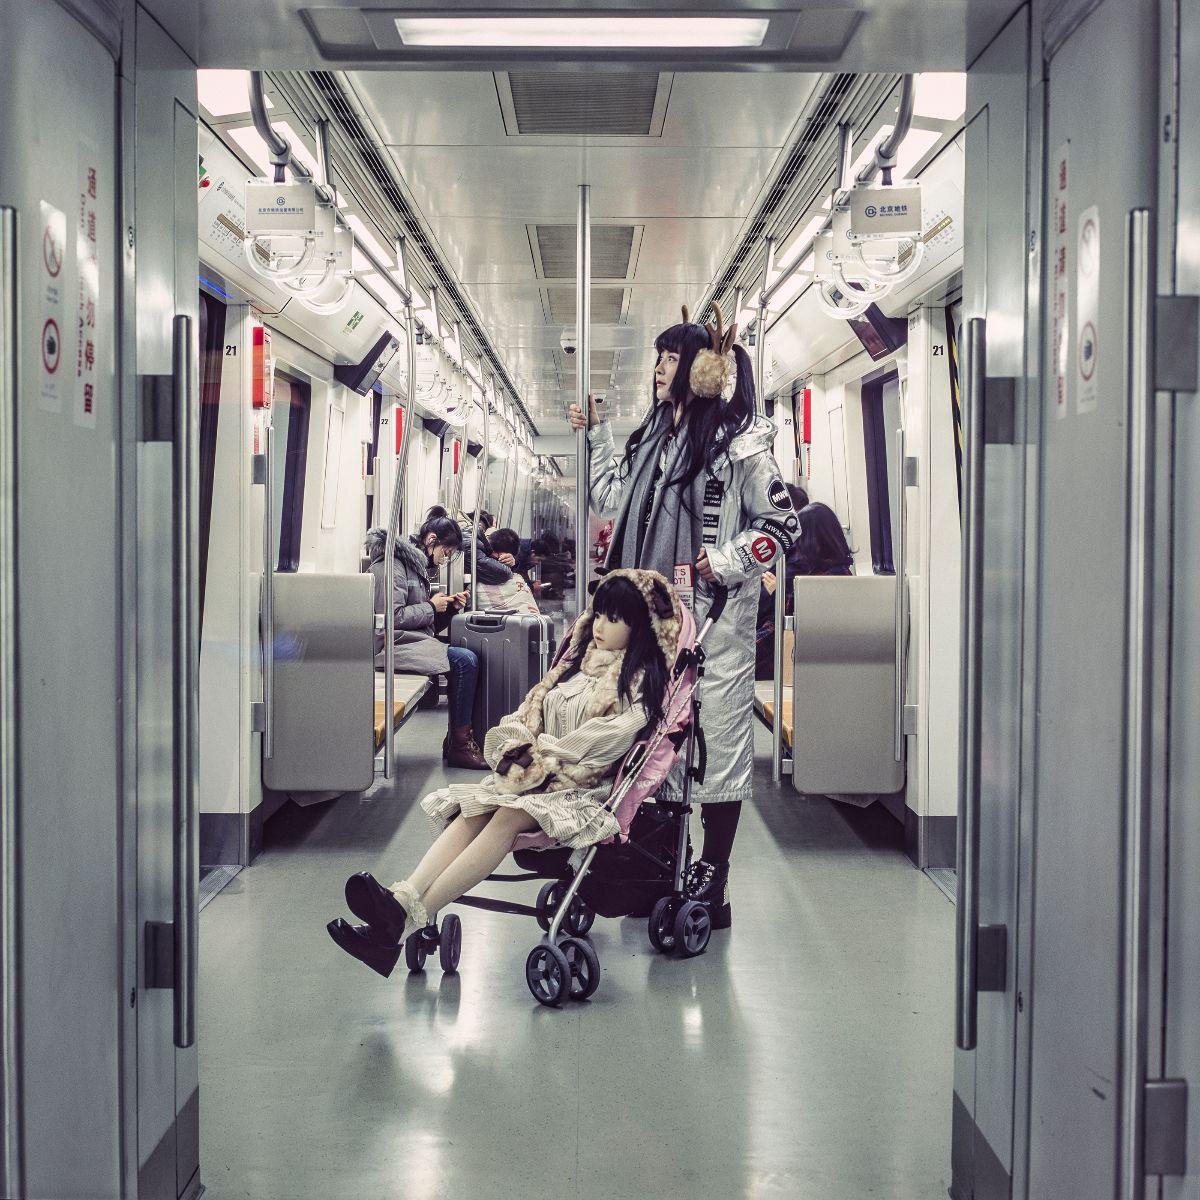 © Gangfeng Zhou, China, Shortlist, 2019 ZEISS Photography Award